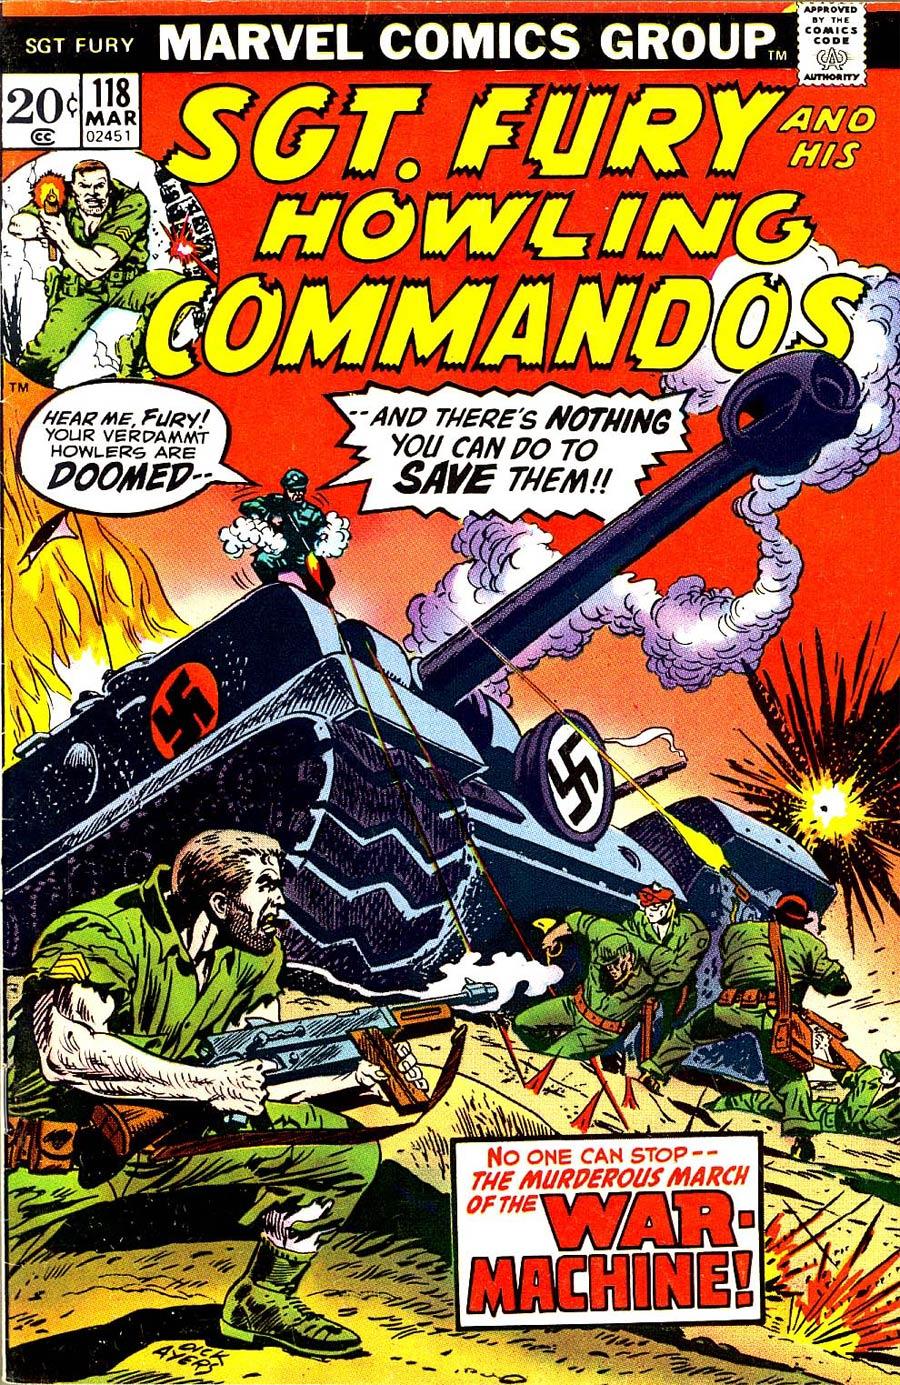 Sgt. Fury & His Howling Commandos #118